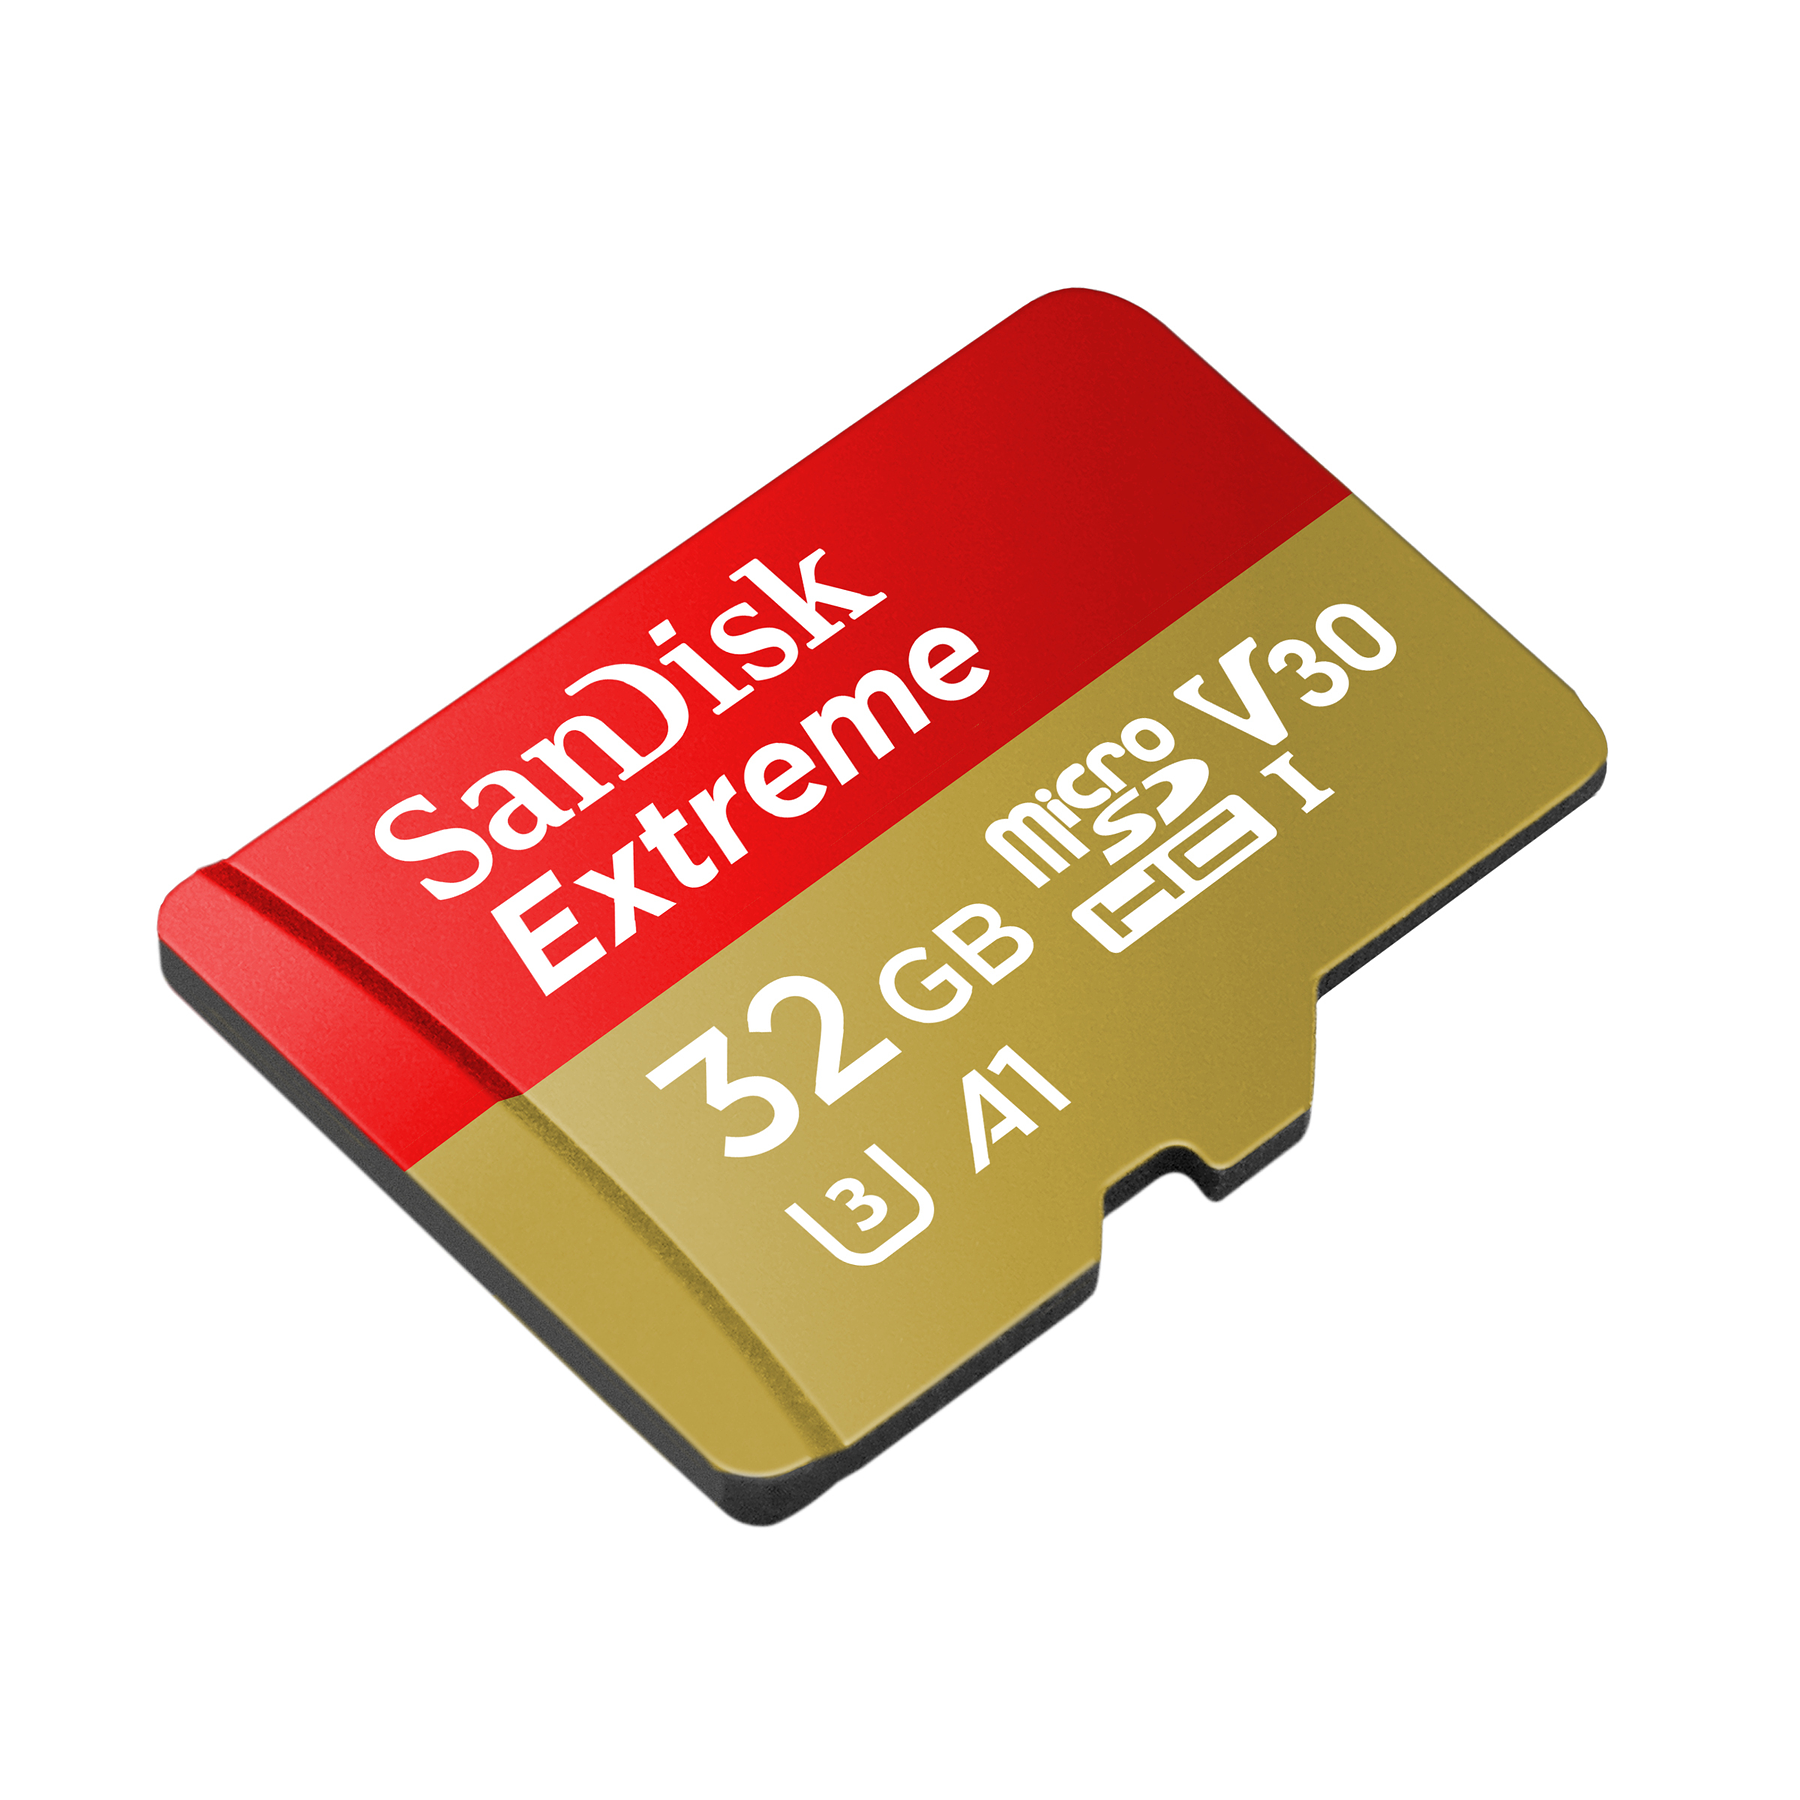 Memoria MicroSDHC 32GB Extreme UHS-I Clase 10, Lectura 100MBs, Escritura 60MBs